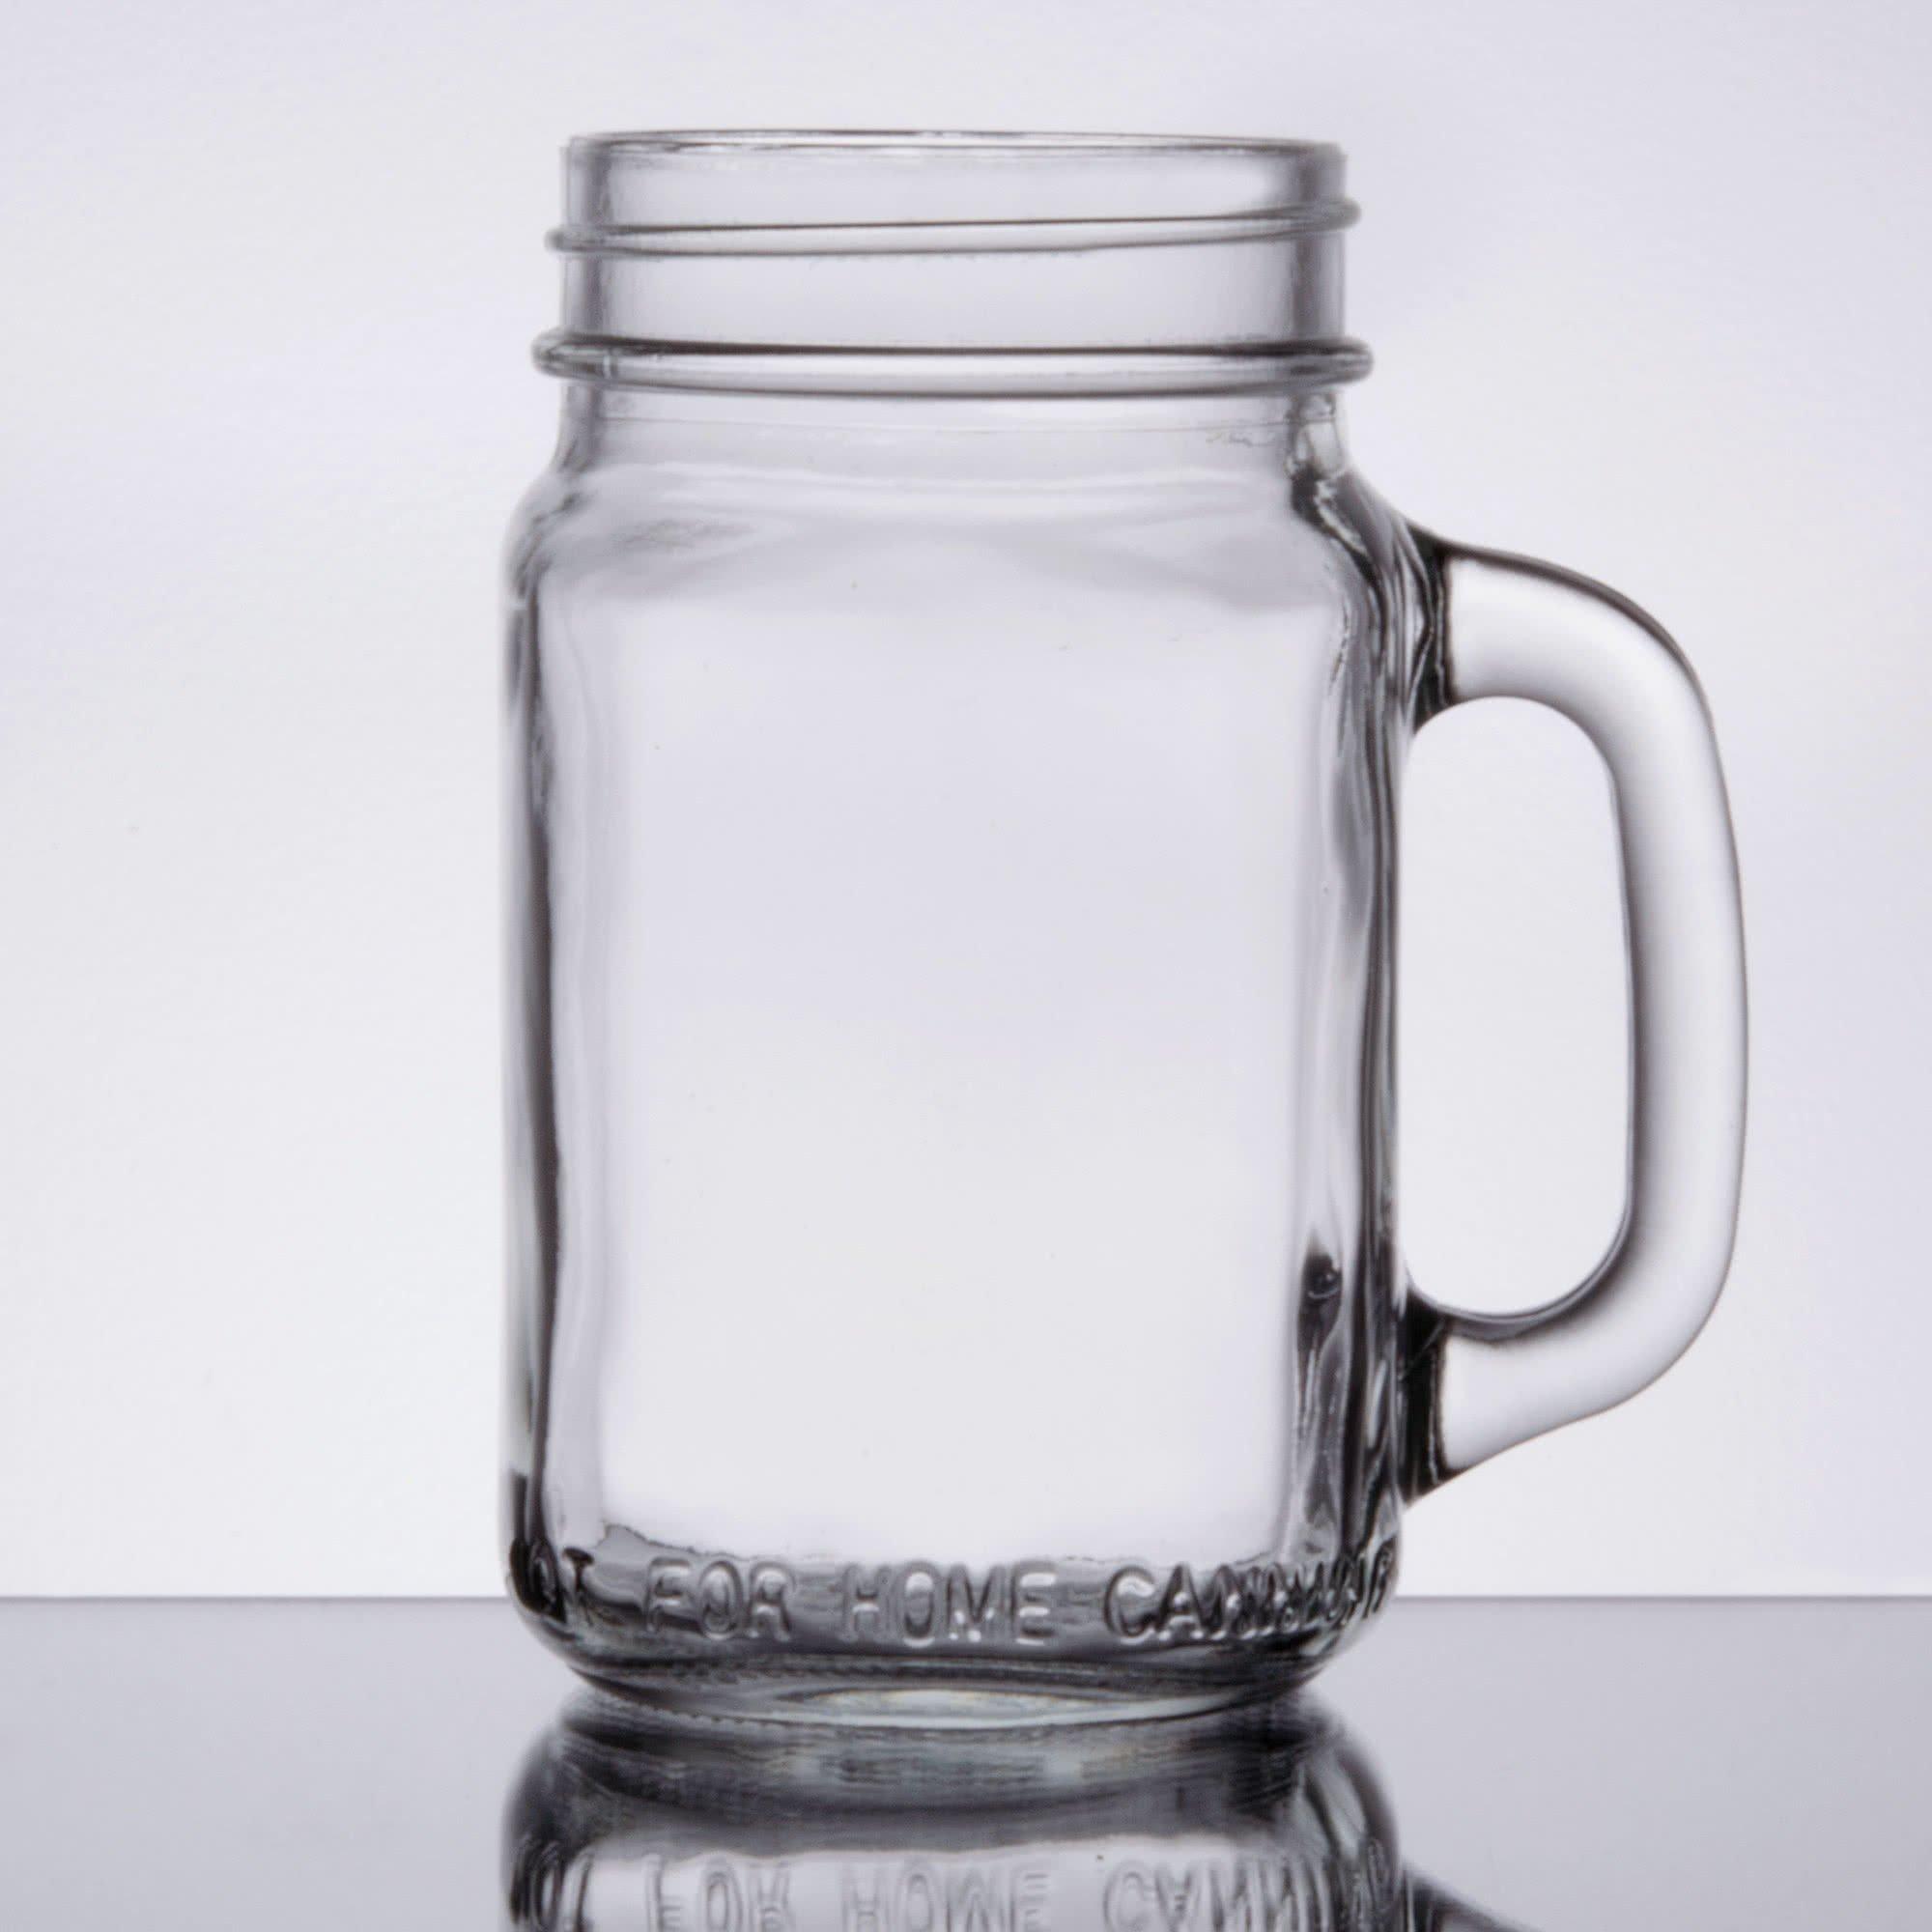 Core 16 oz. Mason Jar/Drinking Jar with Handle - 12/Case